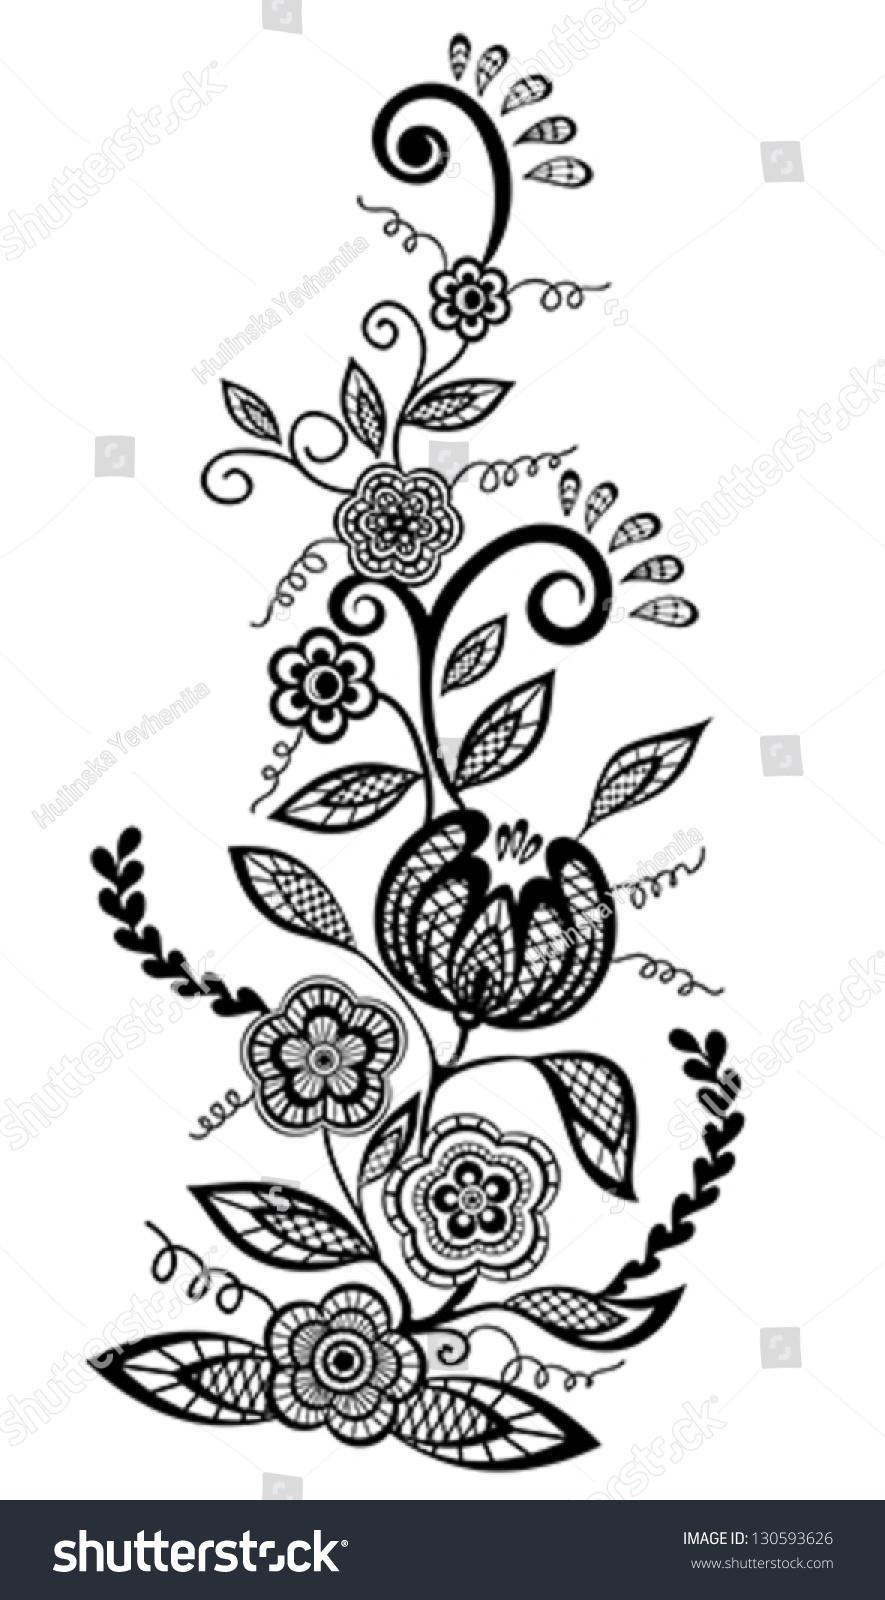 Beautiful Floral Element Blackandwhite Flowers Leaves Stock Vector